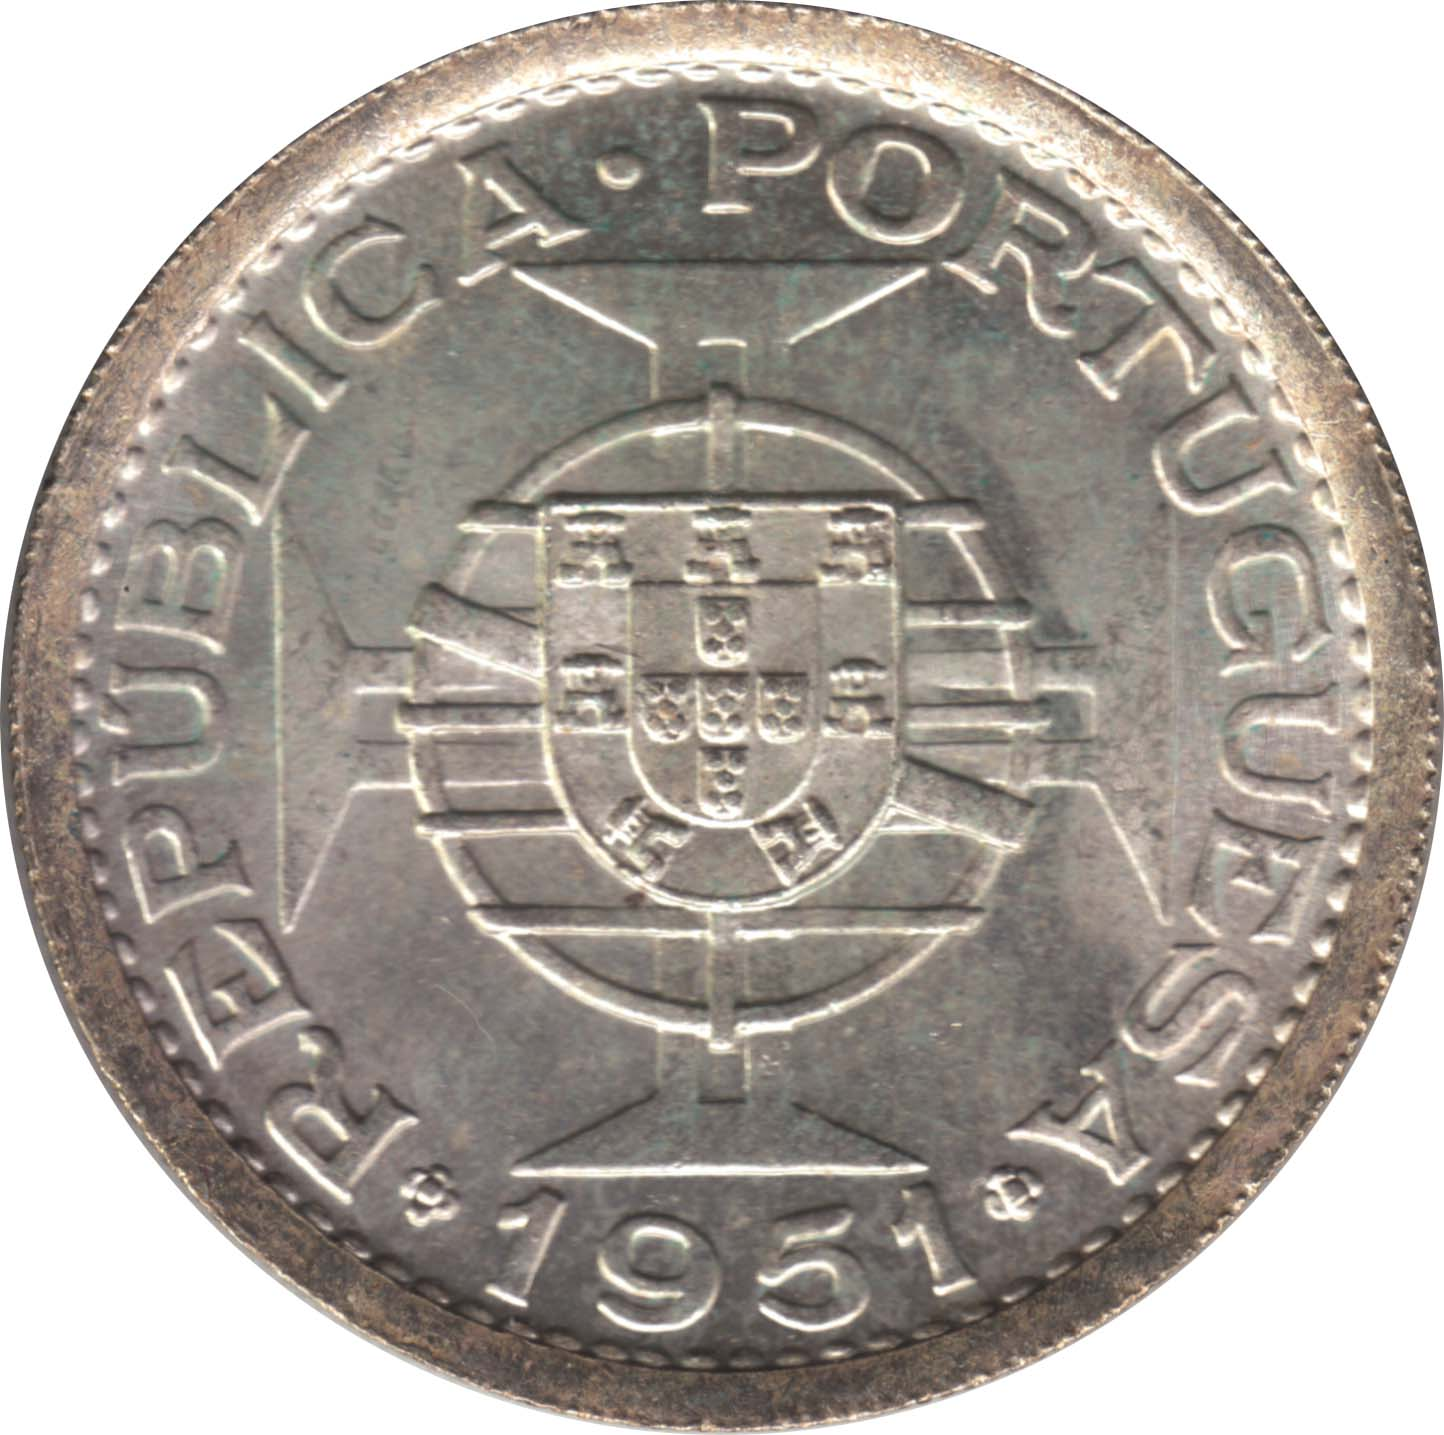 St Thomas /& Prince 1951 10 Escudos Silver Coin KM #14 Choice-Gem BU